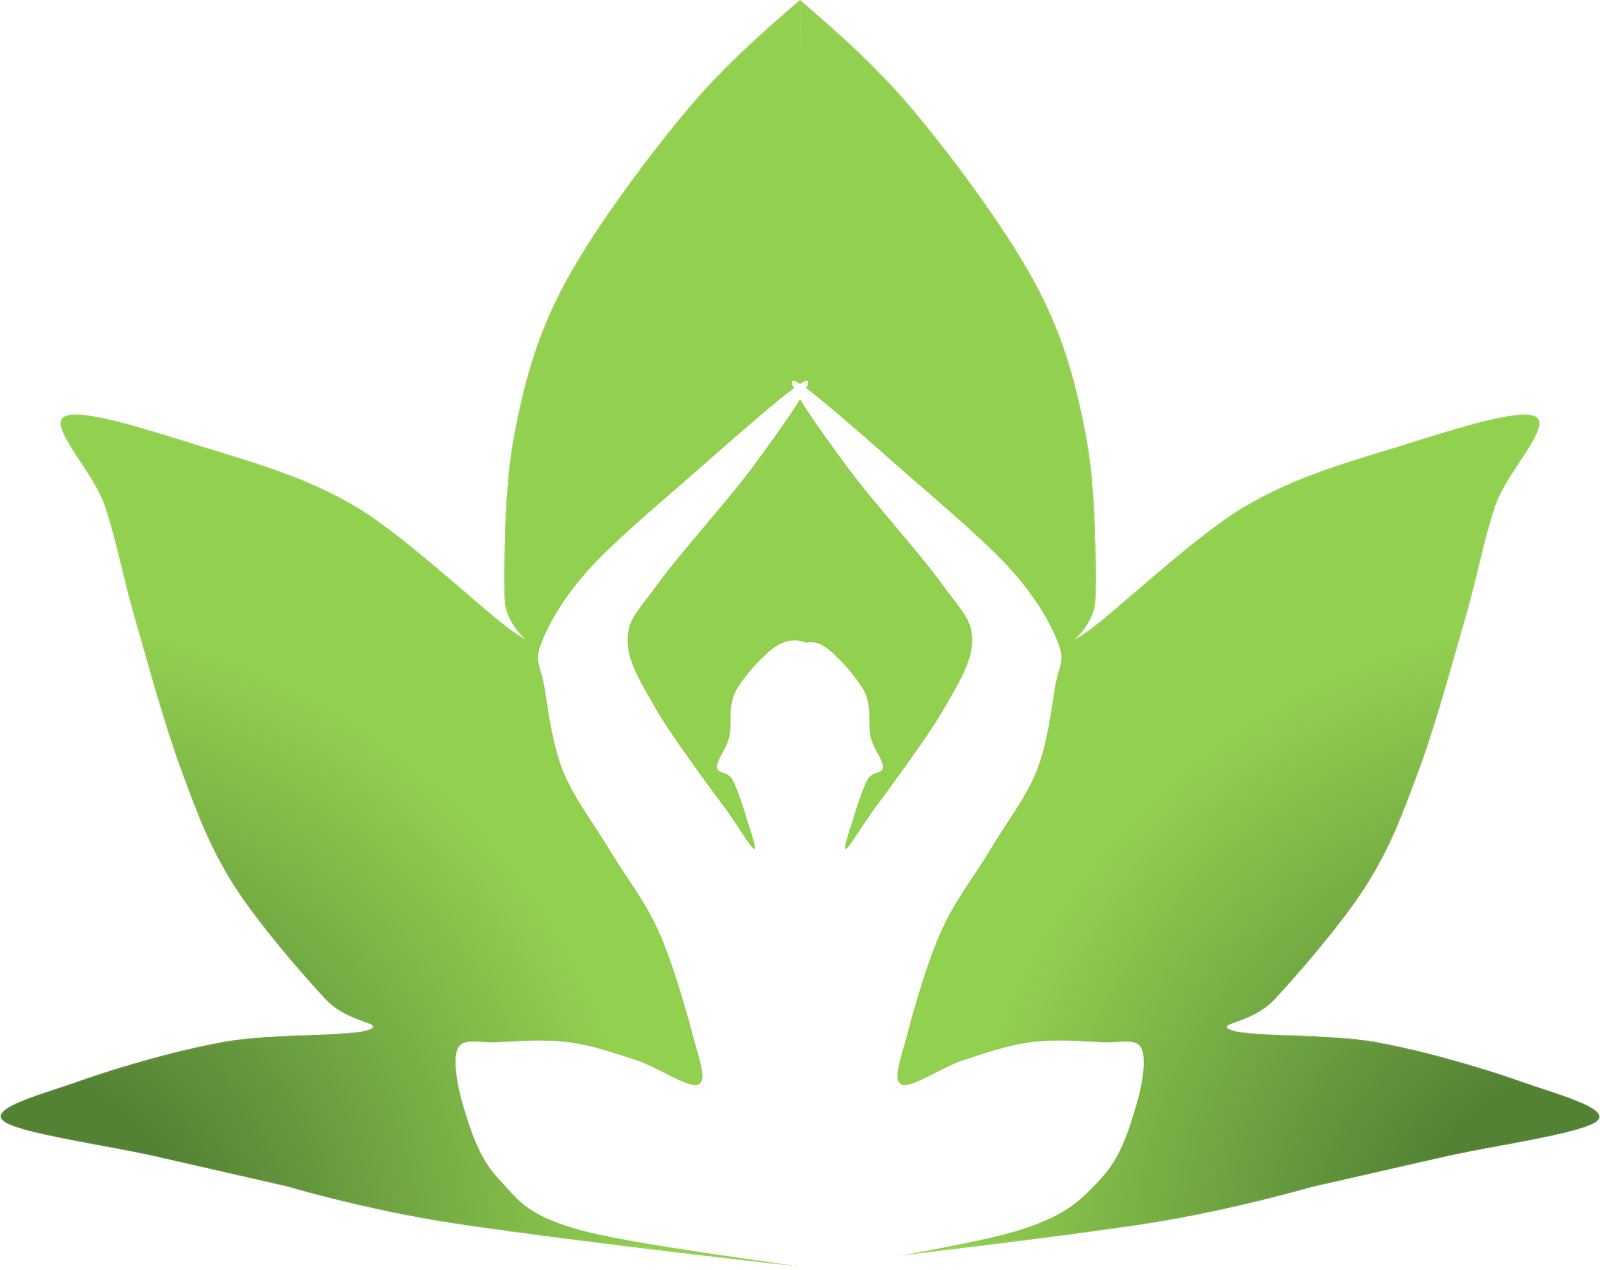 Mandala clipart affirmation, Mandala affirmation Transparent.